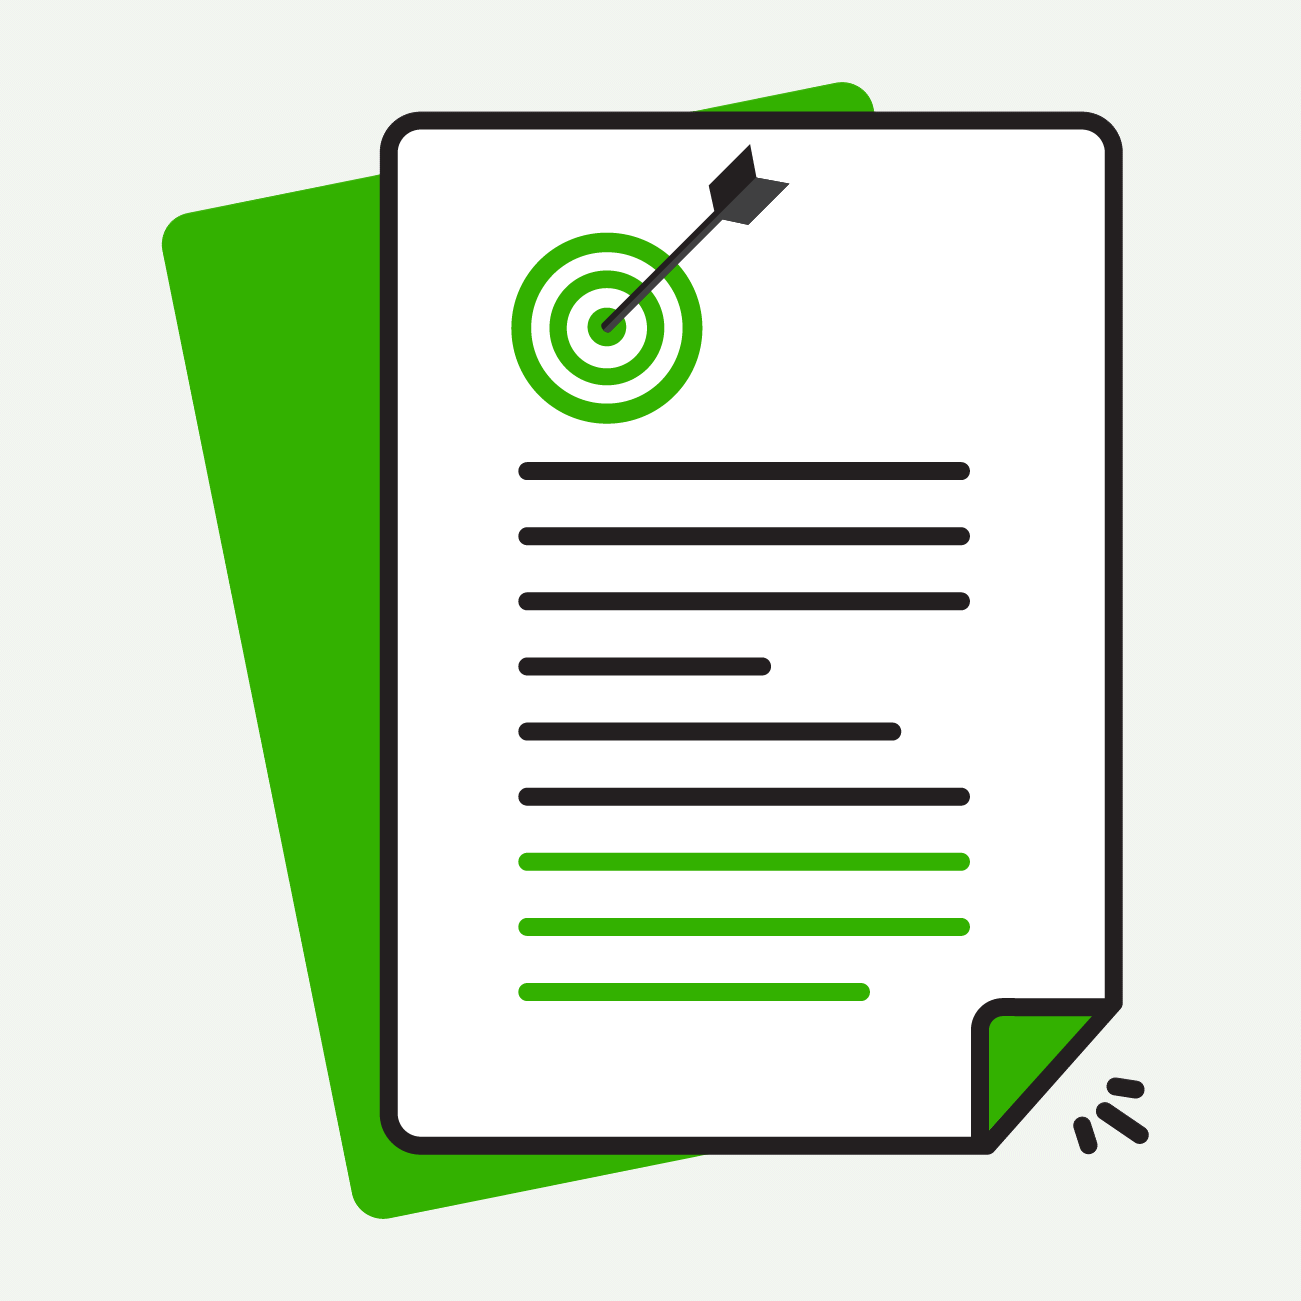 tailored plan icon